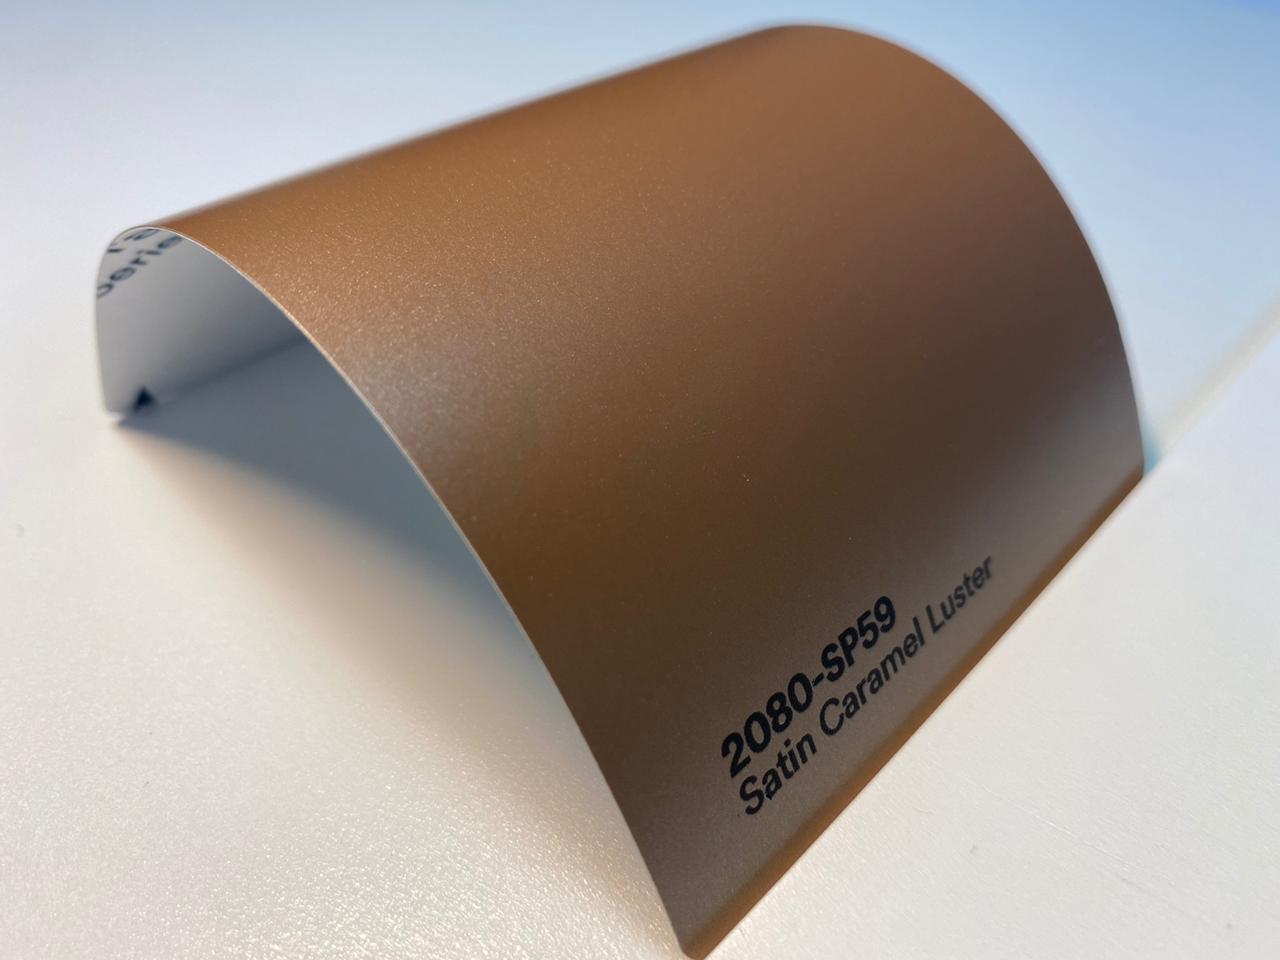 3M Wrap Film Series 2080-SP59, Satin Caramel Luster